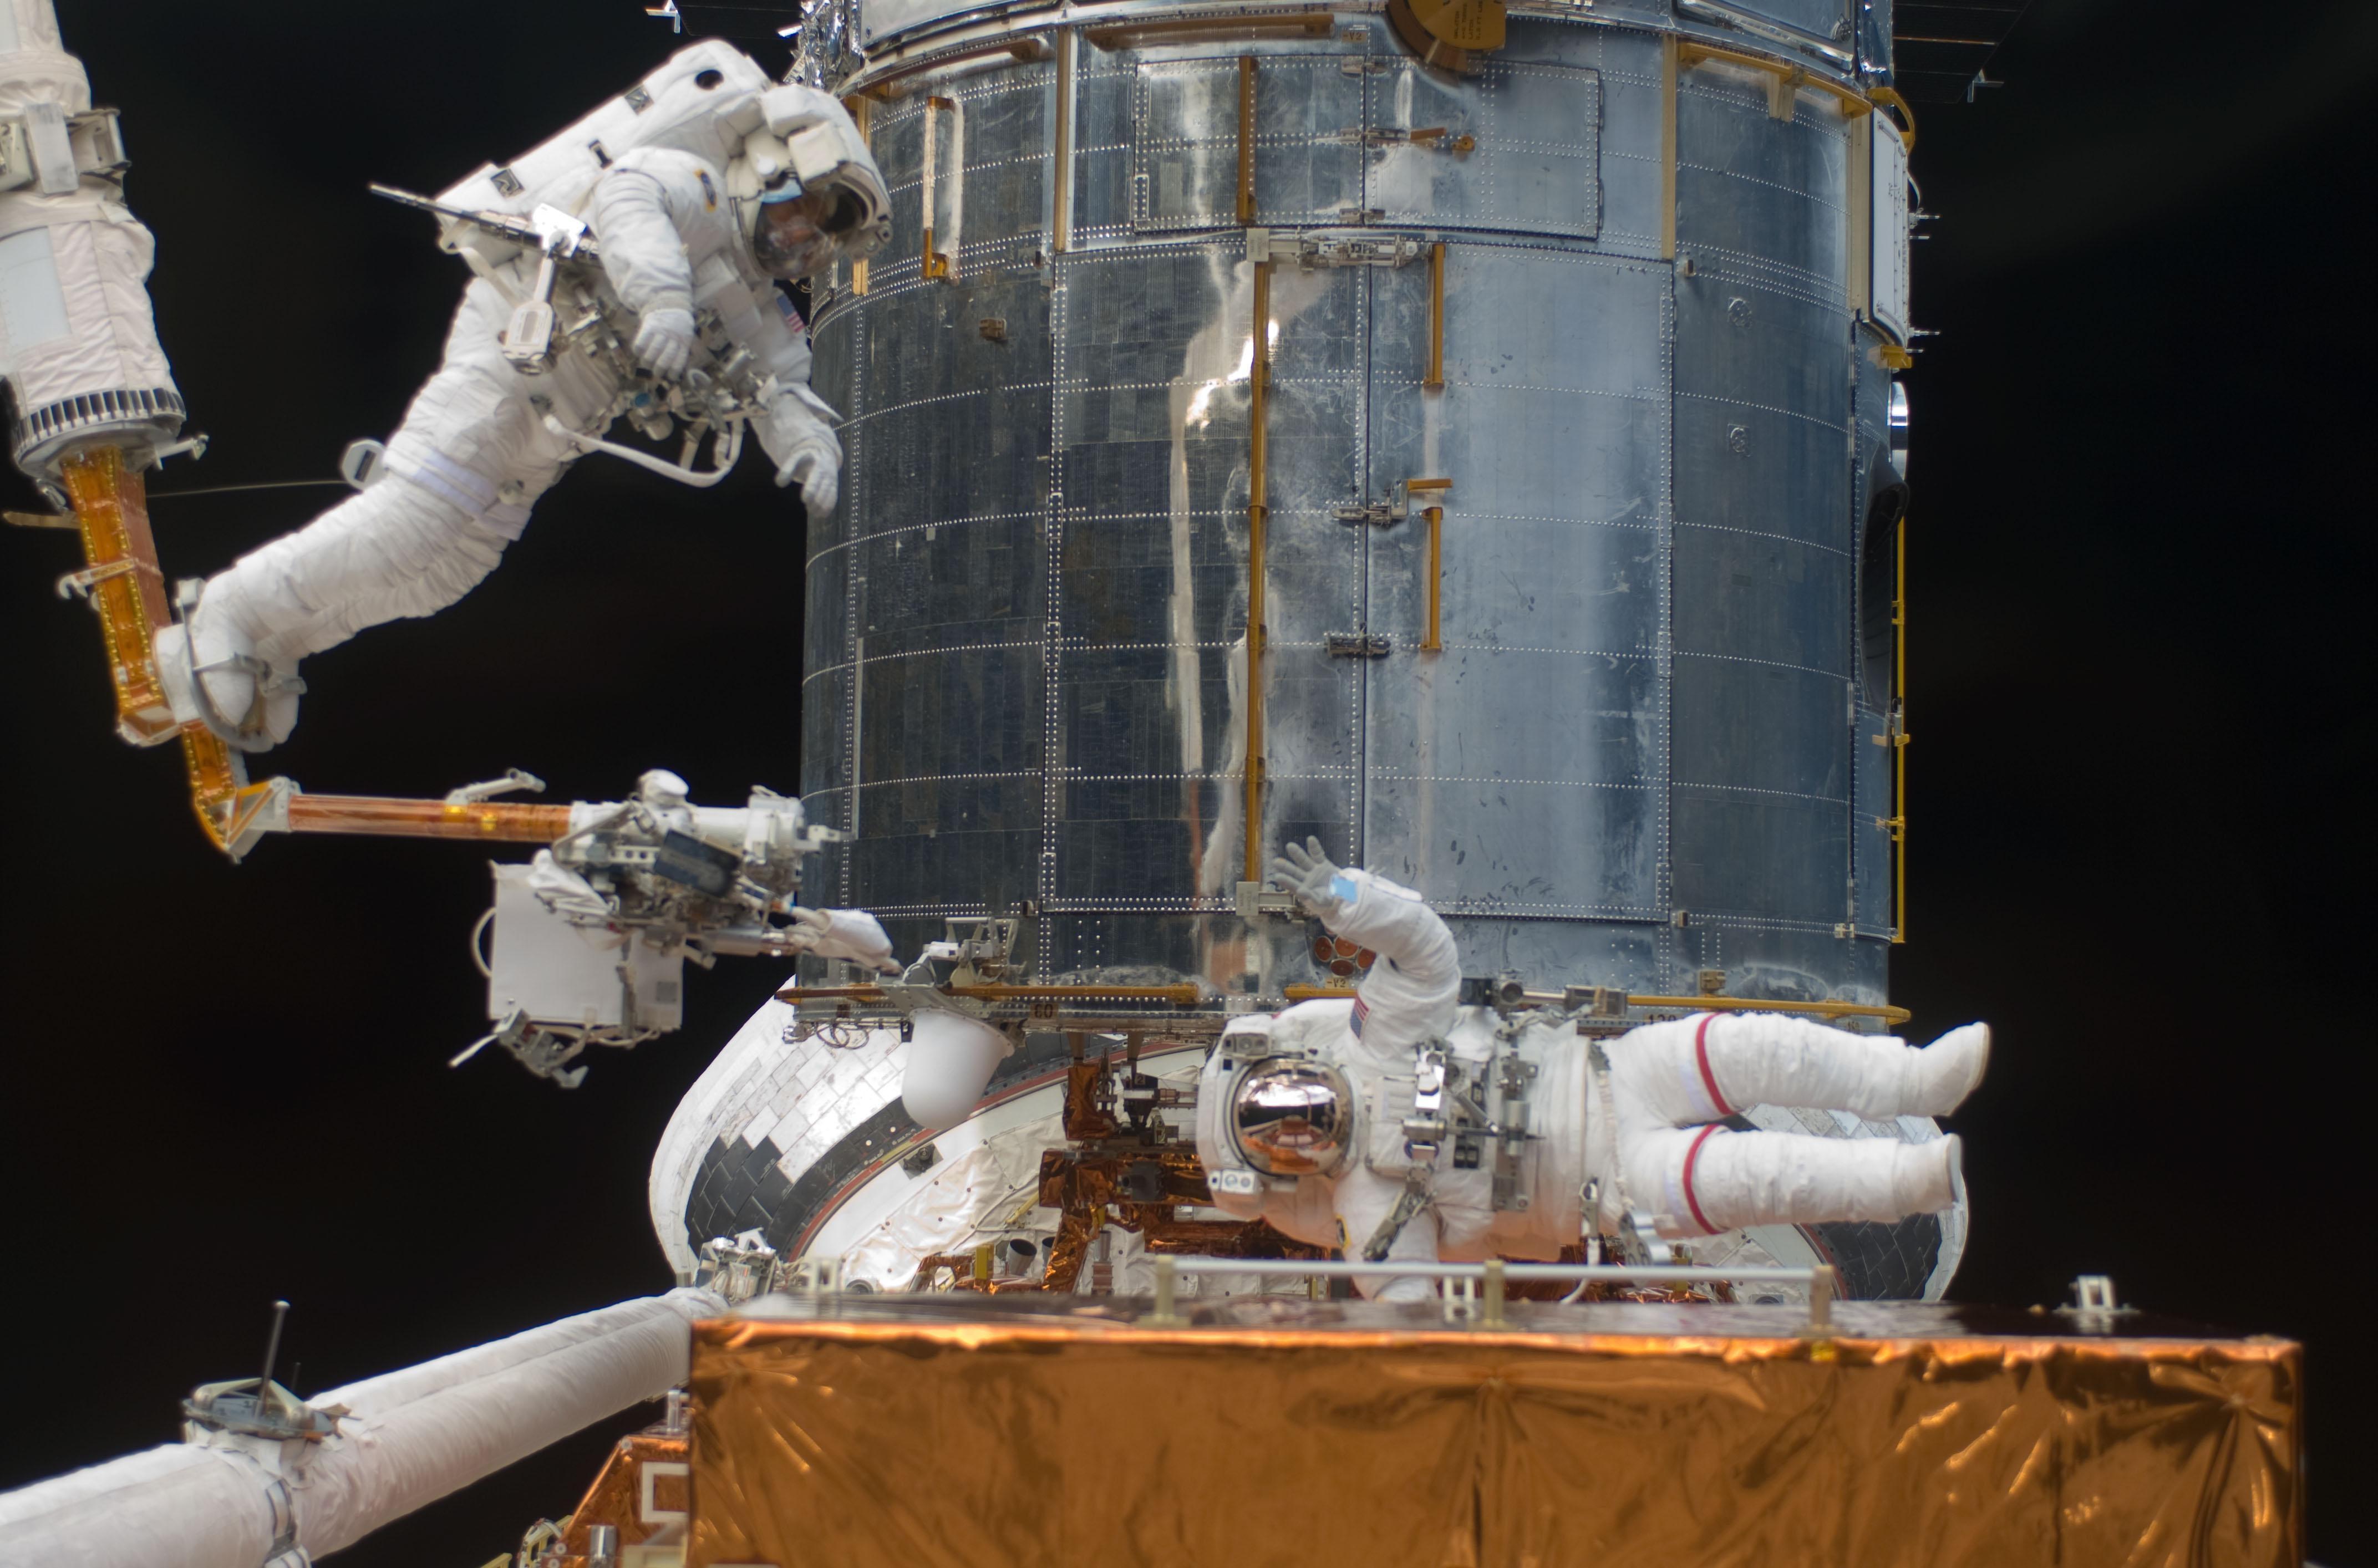 hubble telescope repair mission 2009 - photo #4